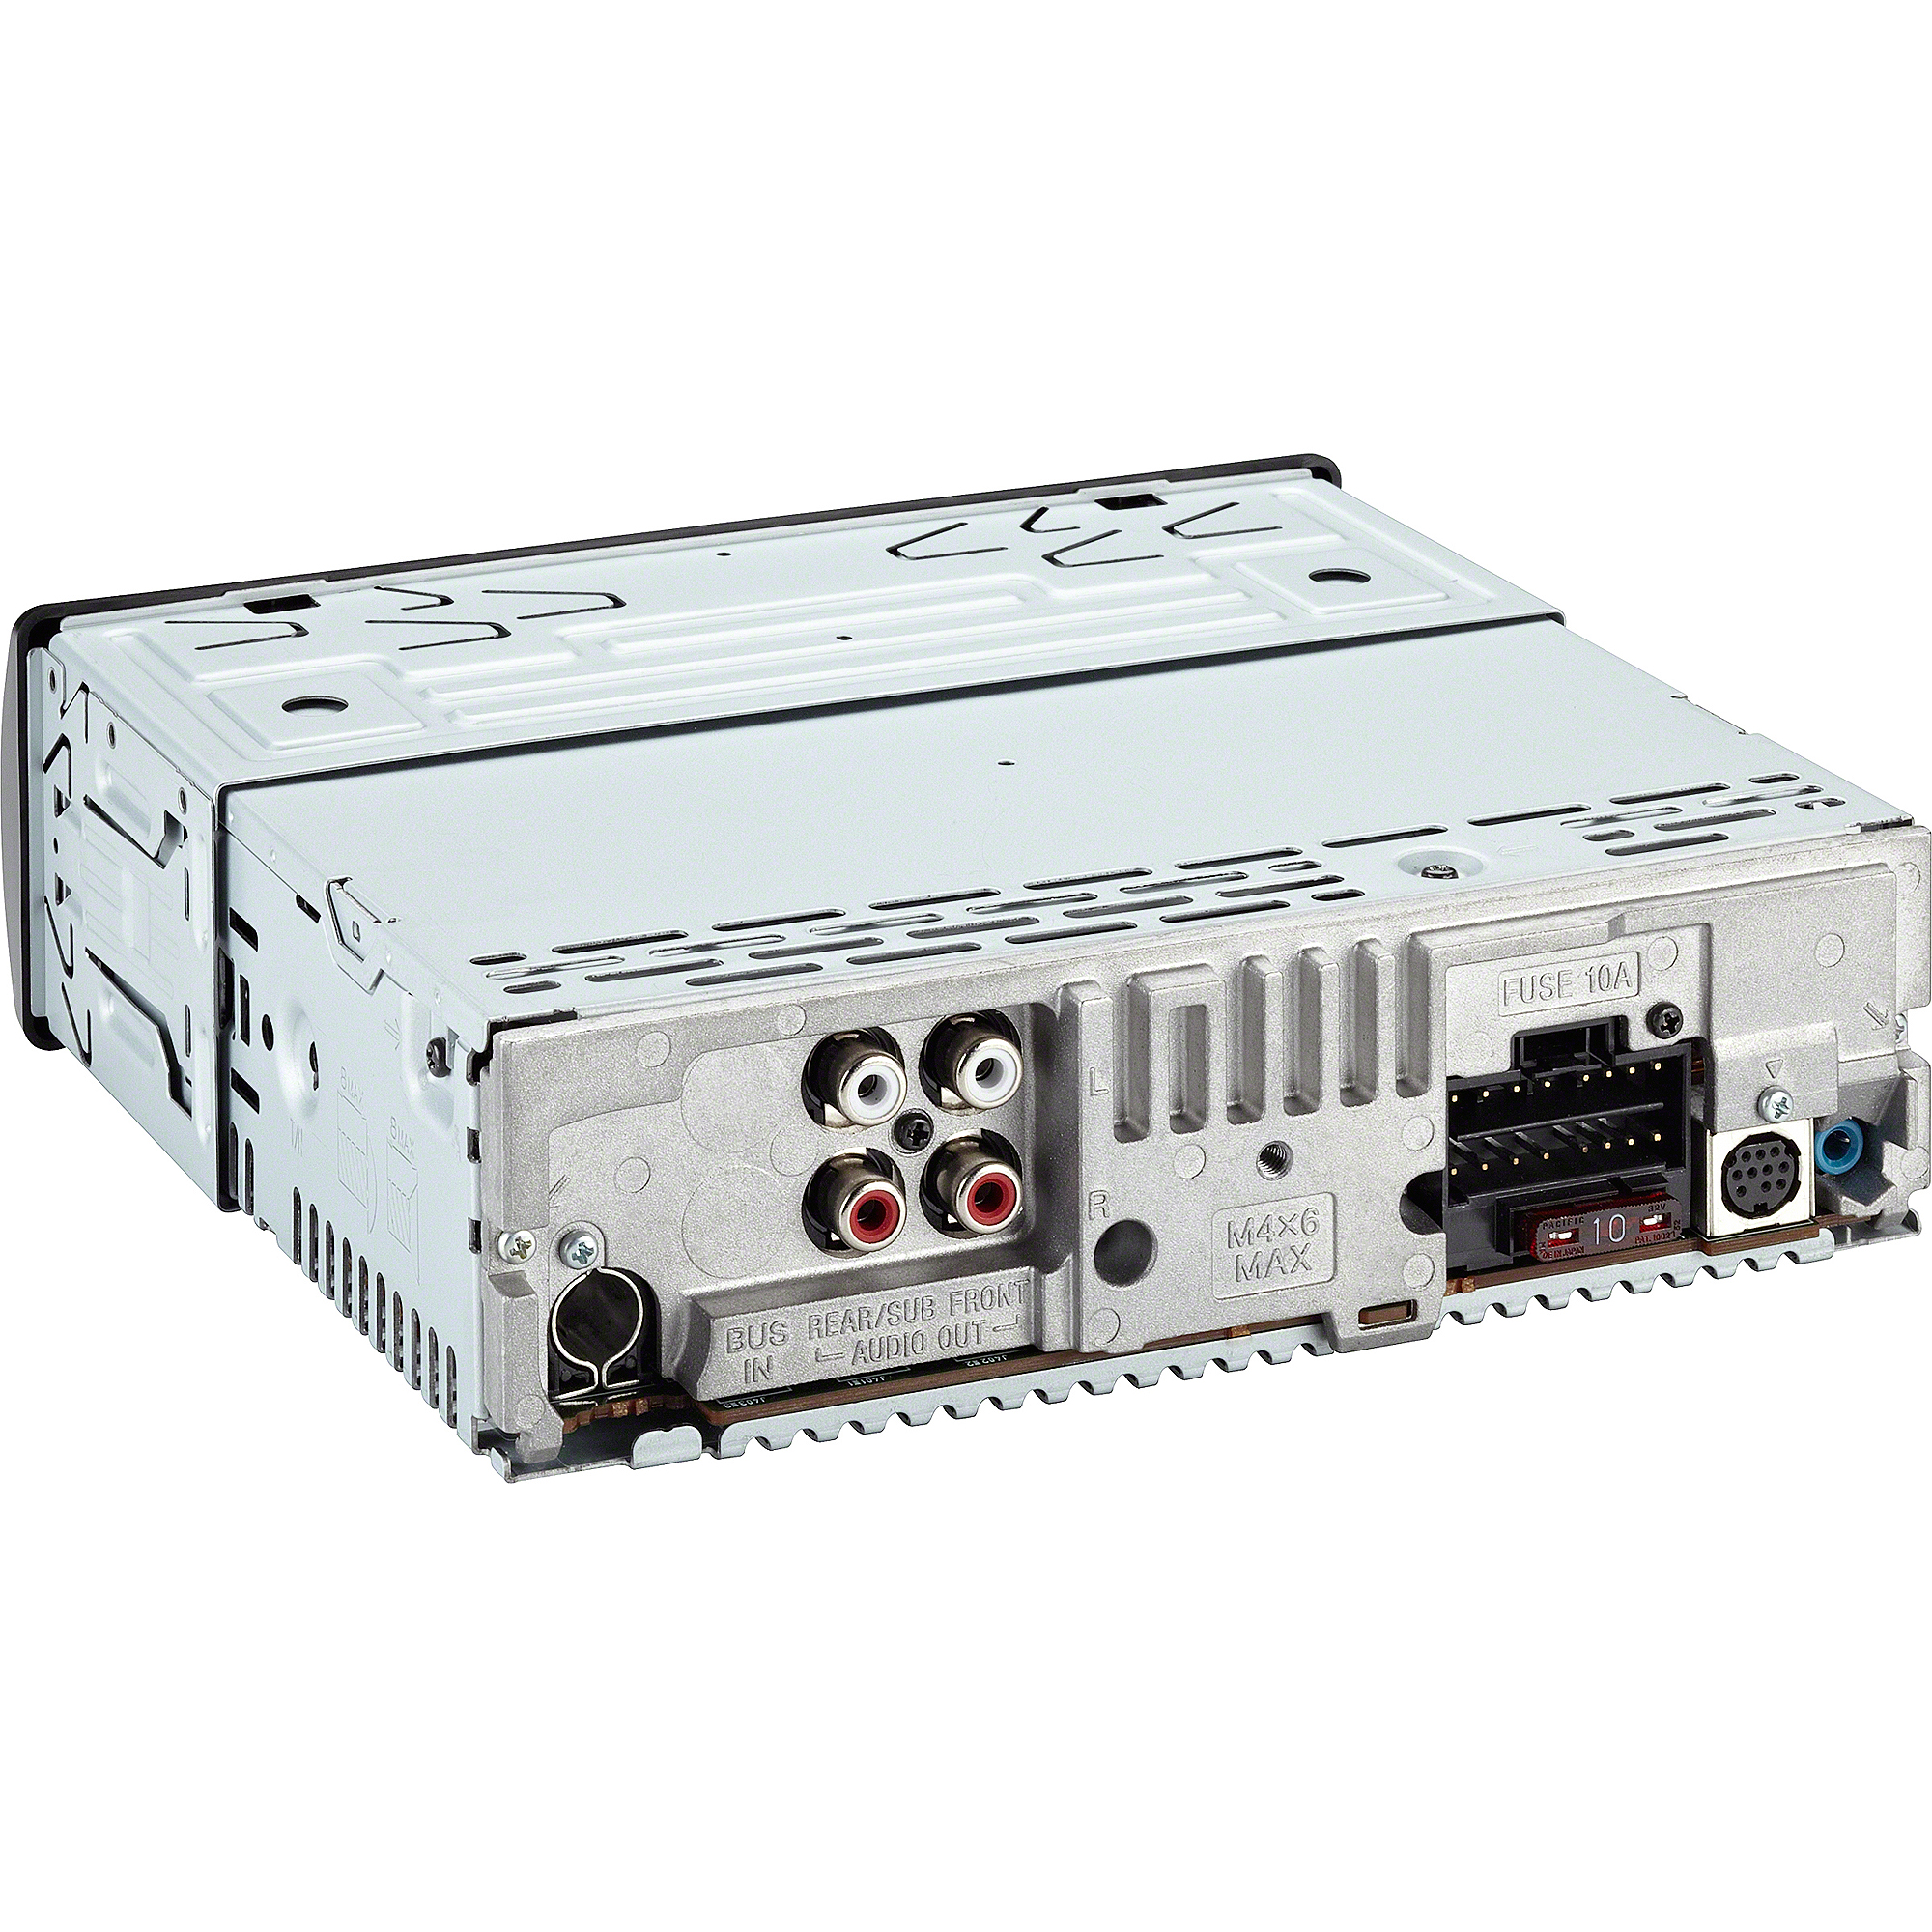 sony cdx gt540ui wiring diagram sony cdx m630 wiring